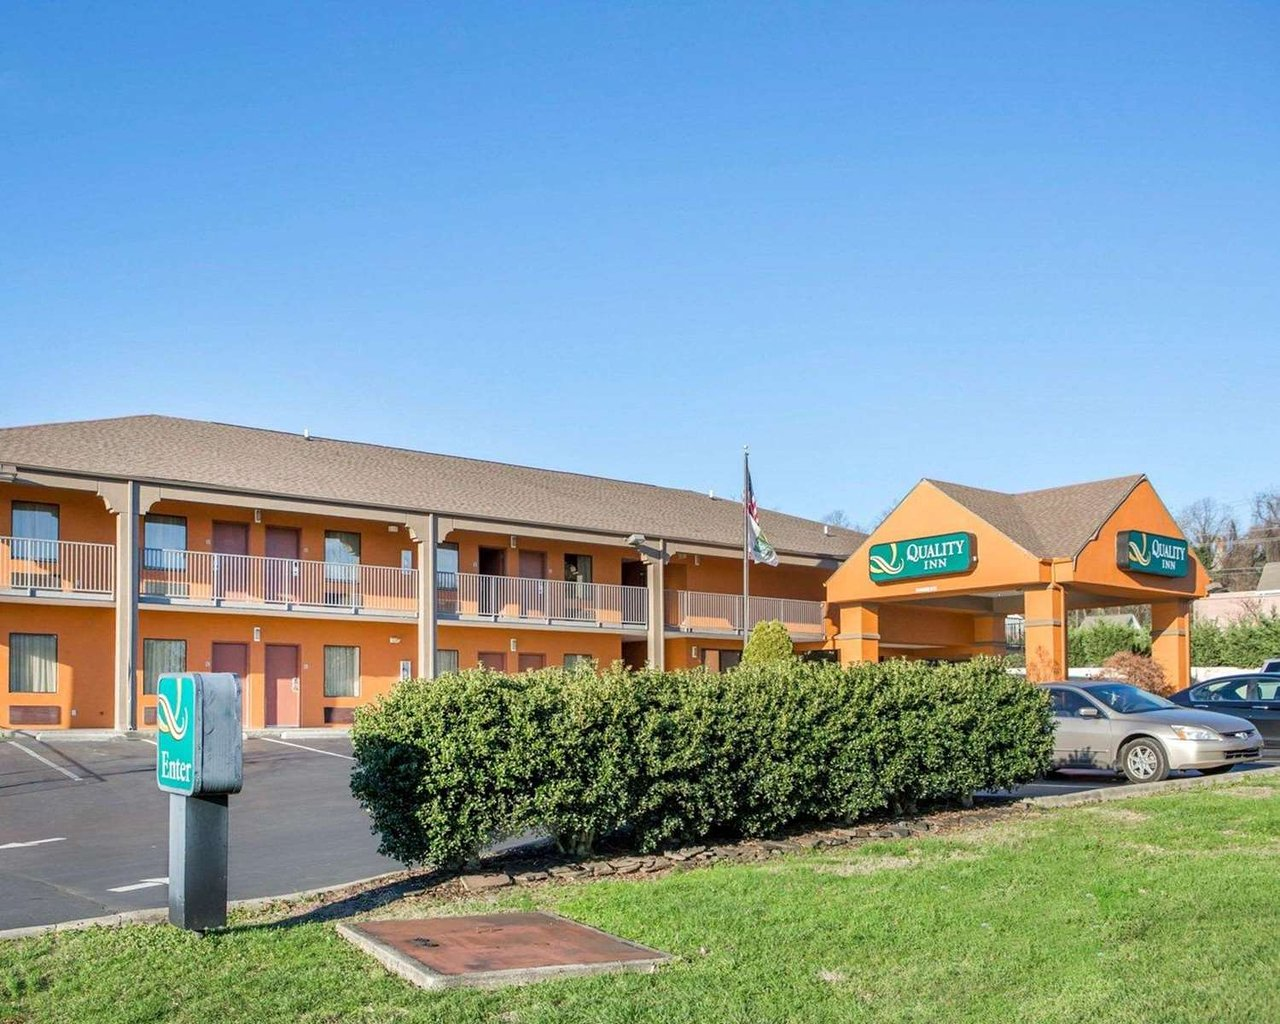 quality inn downtown 66 9 0 updated 2019 prices hotel rh tripadvisor com